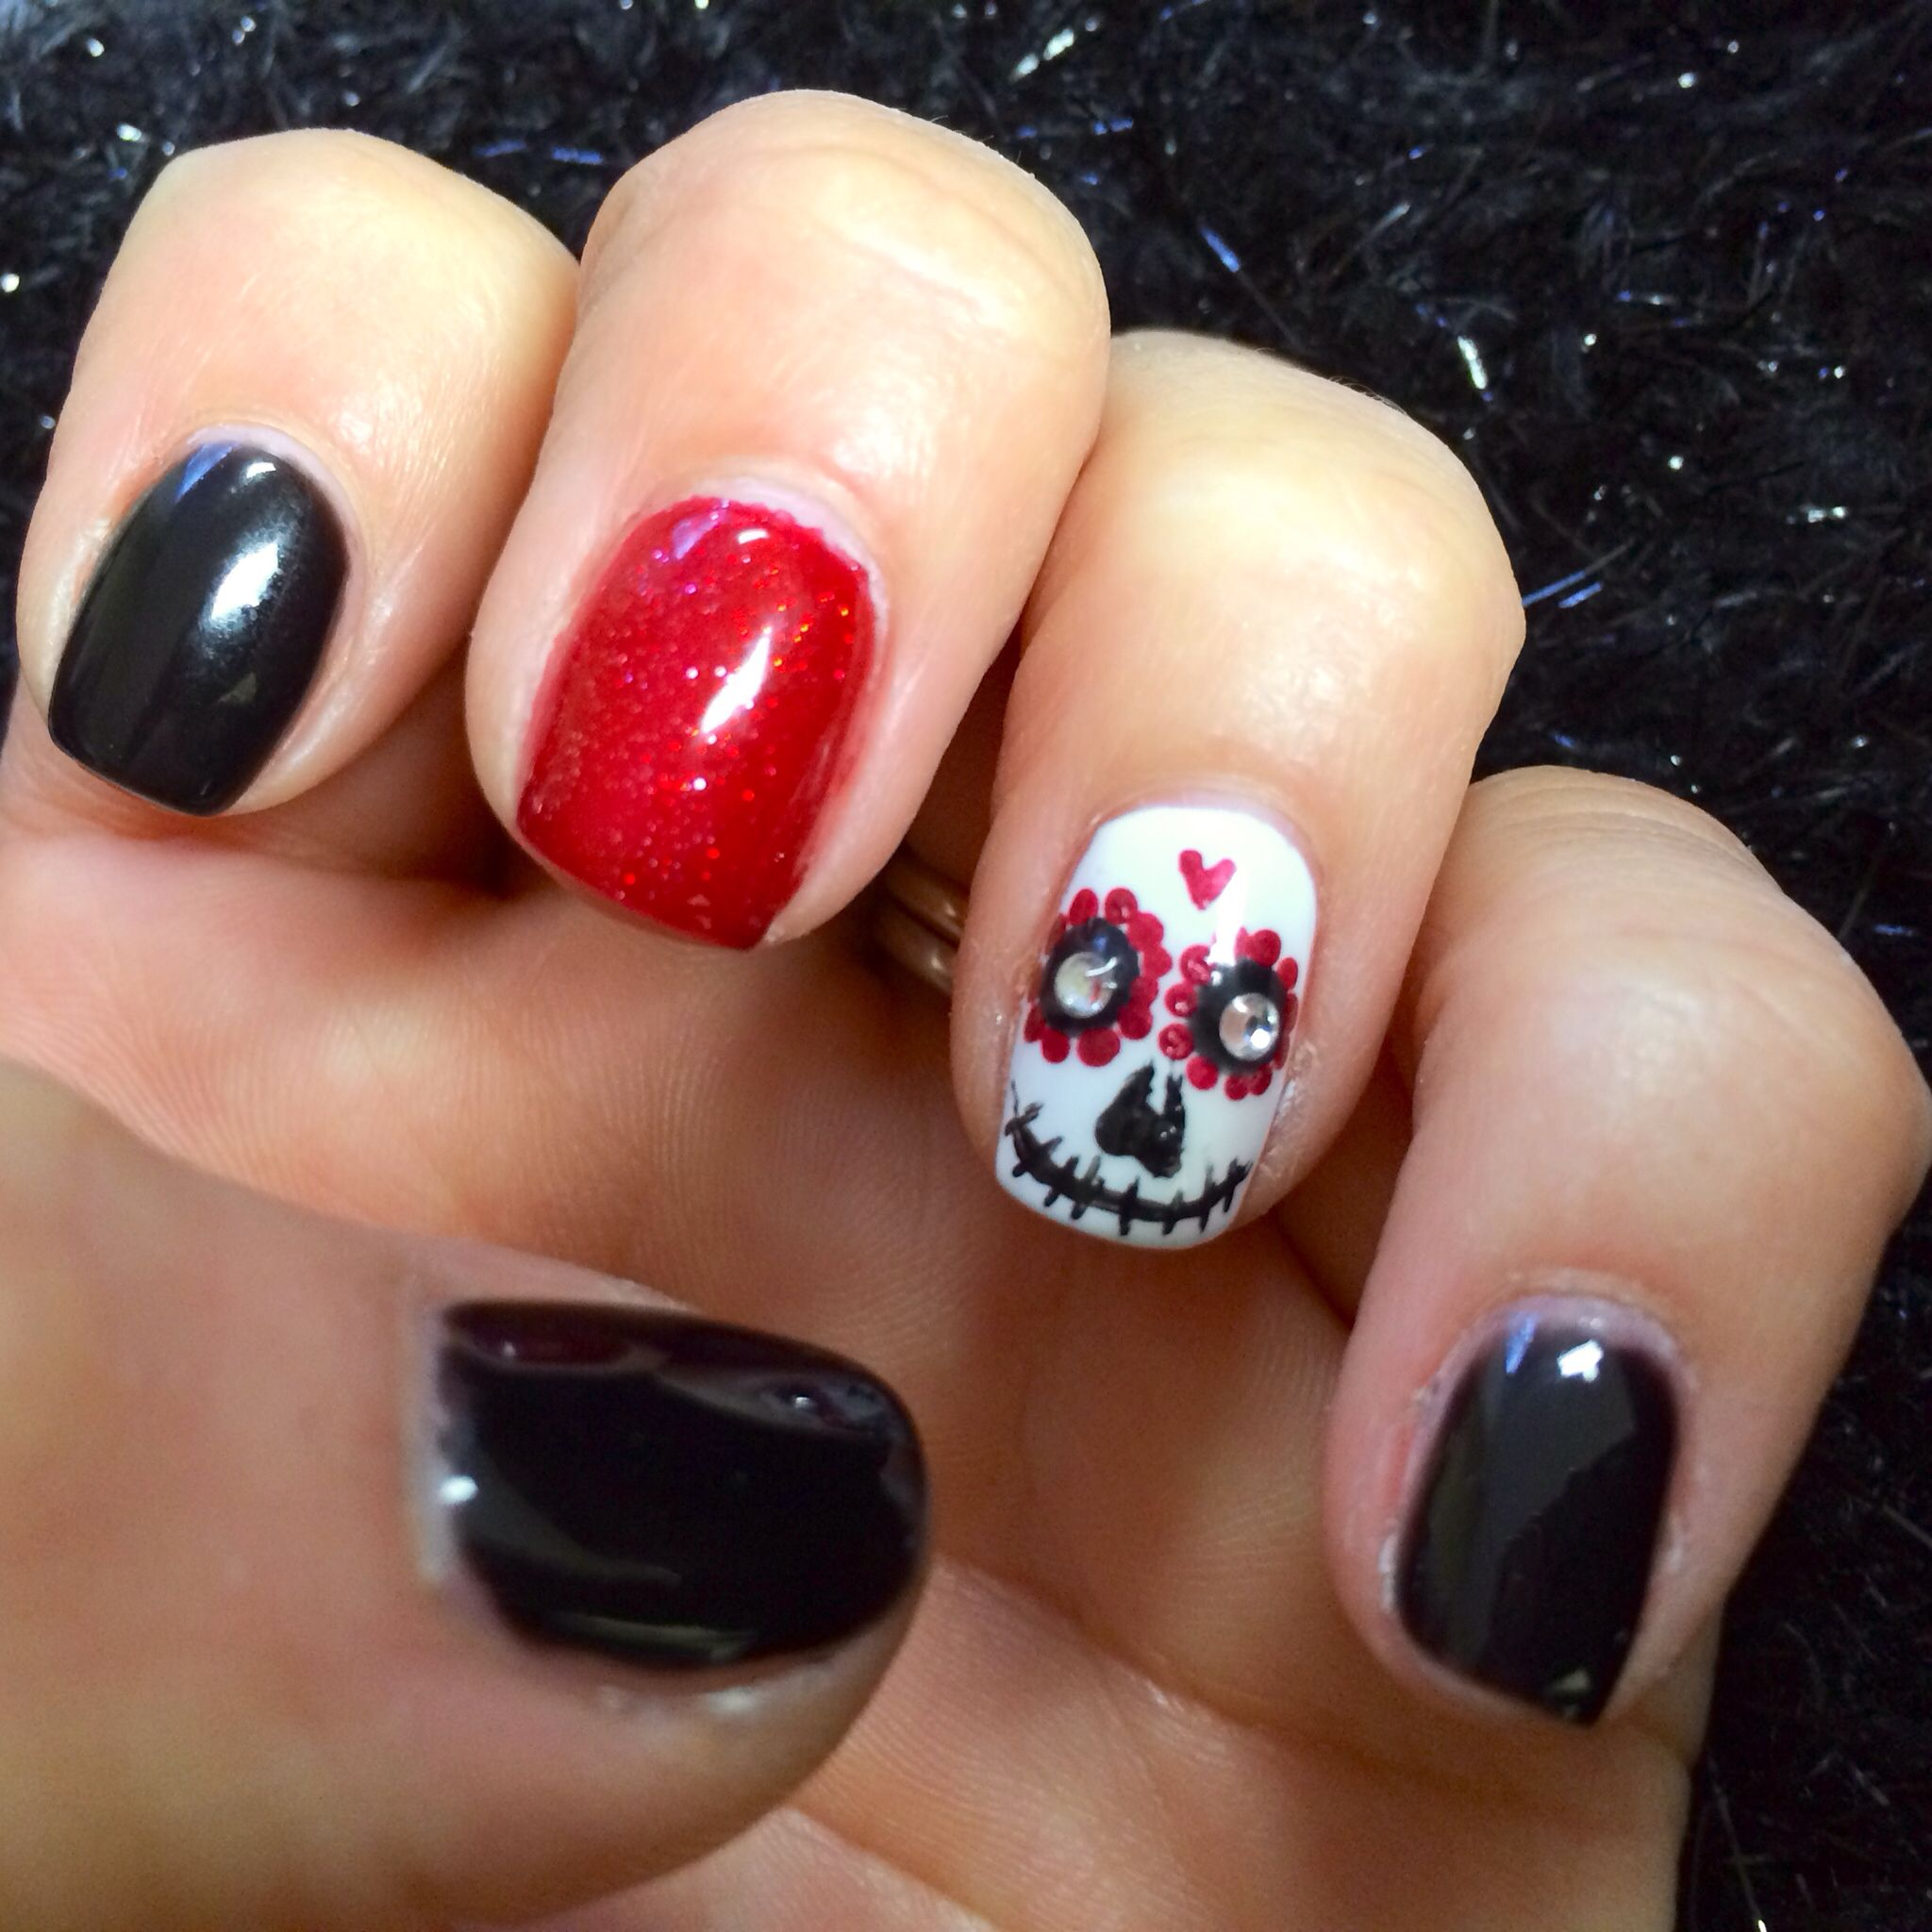 Sugar skull nail design | beauty | Pinterest | Cuidado de la piel ...